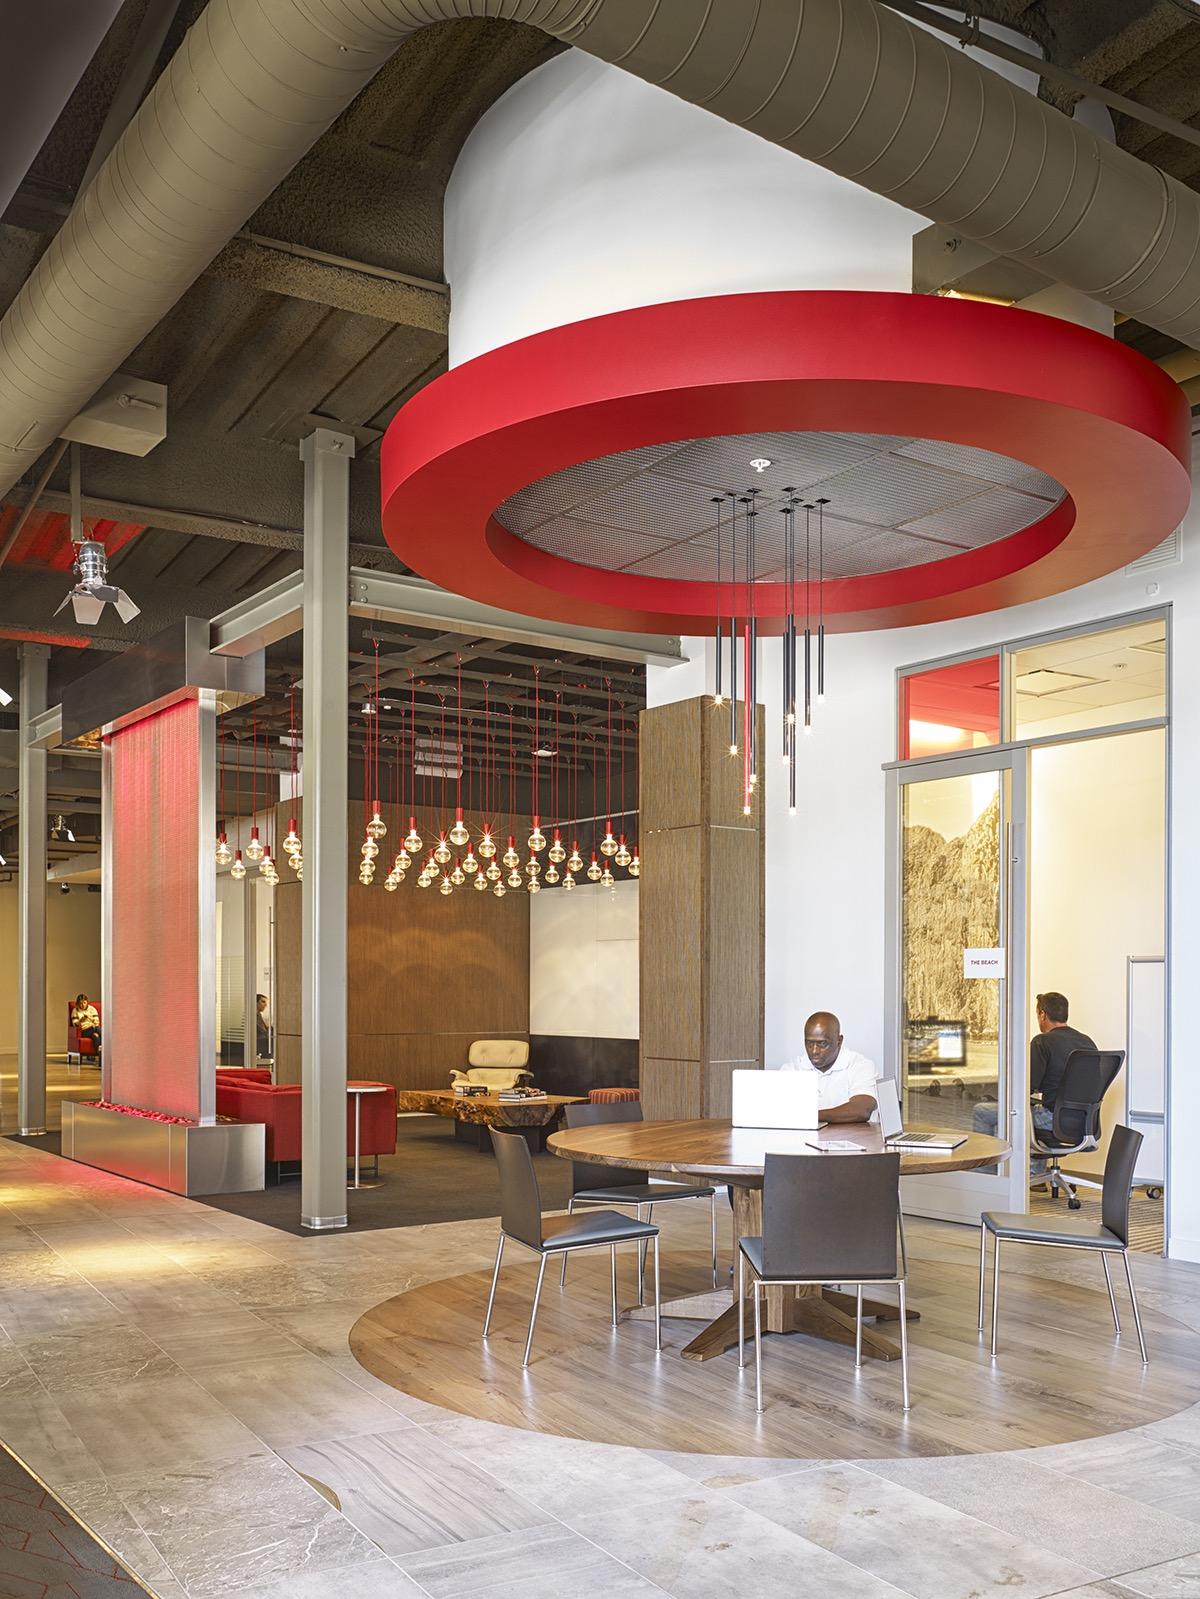 A Tour of Netflix's Los Gatos HQ - Officelovin'